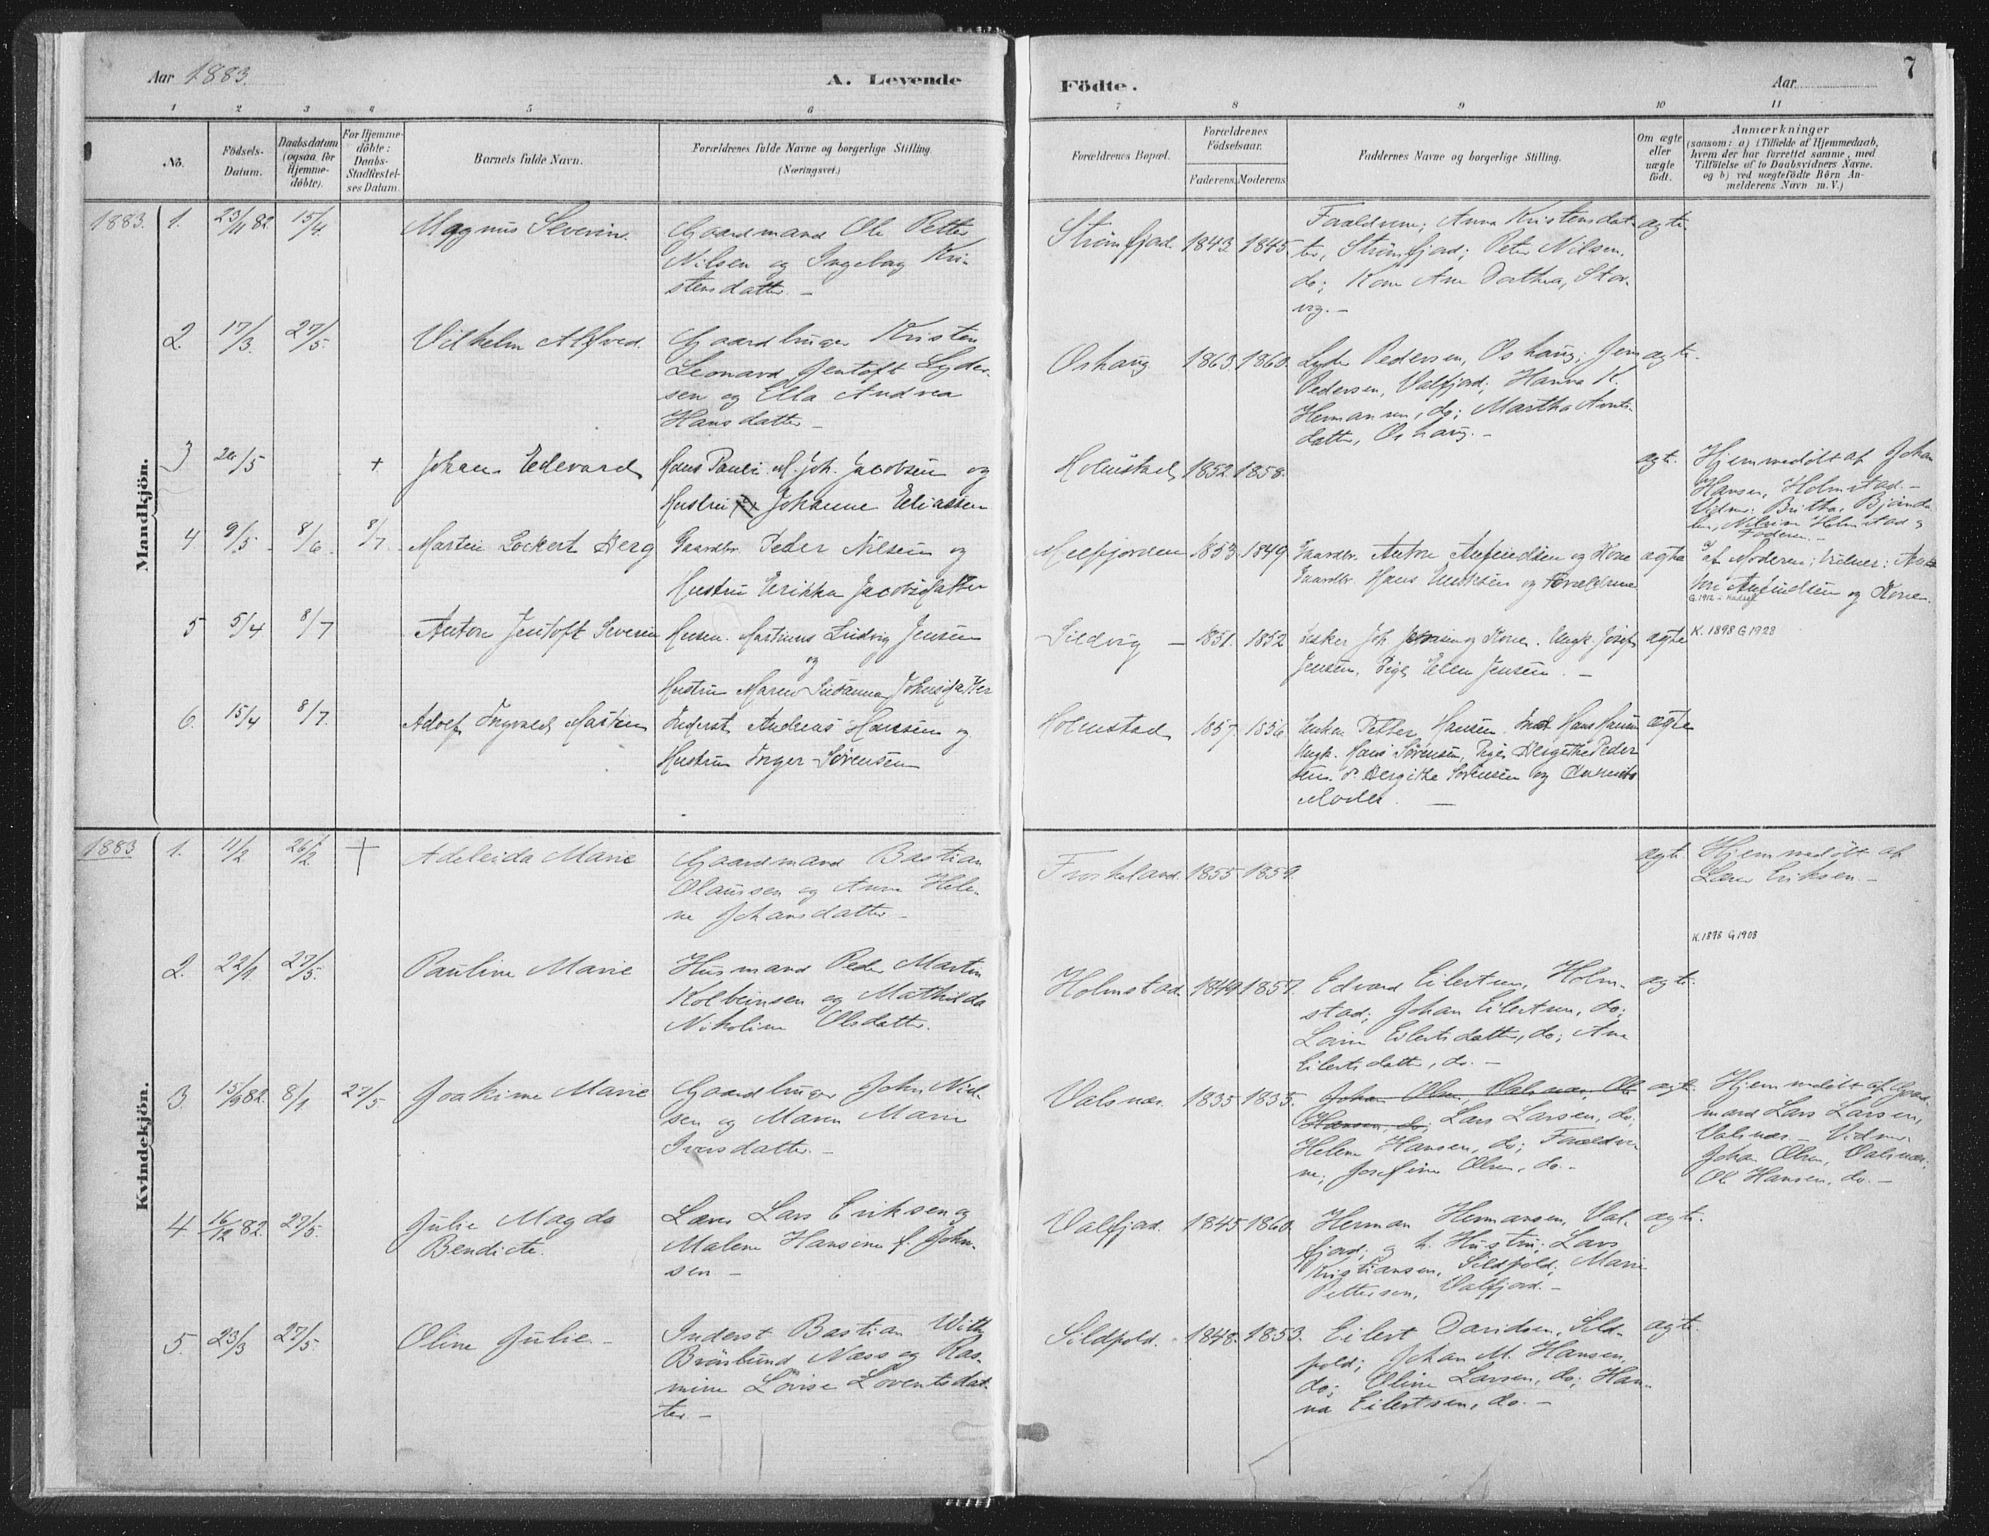 SAT, Ministerialprotokoller, klokkerbøker og fødselsregistre - Nordland, 890/L1286: Ministerialbok nr. 890A01, 1882-1902, s. 7